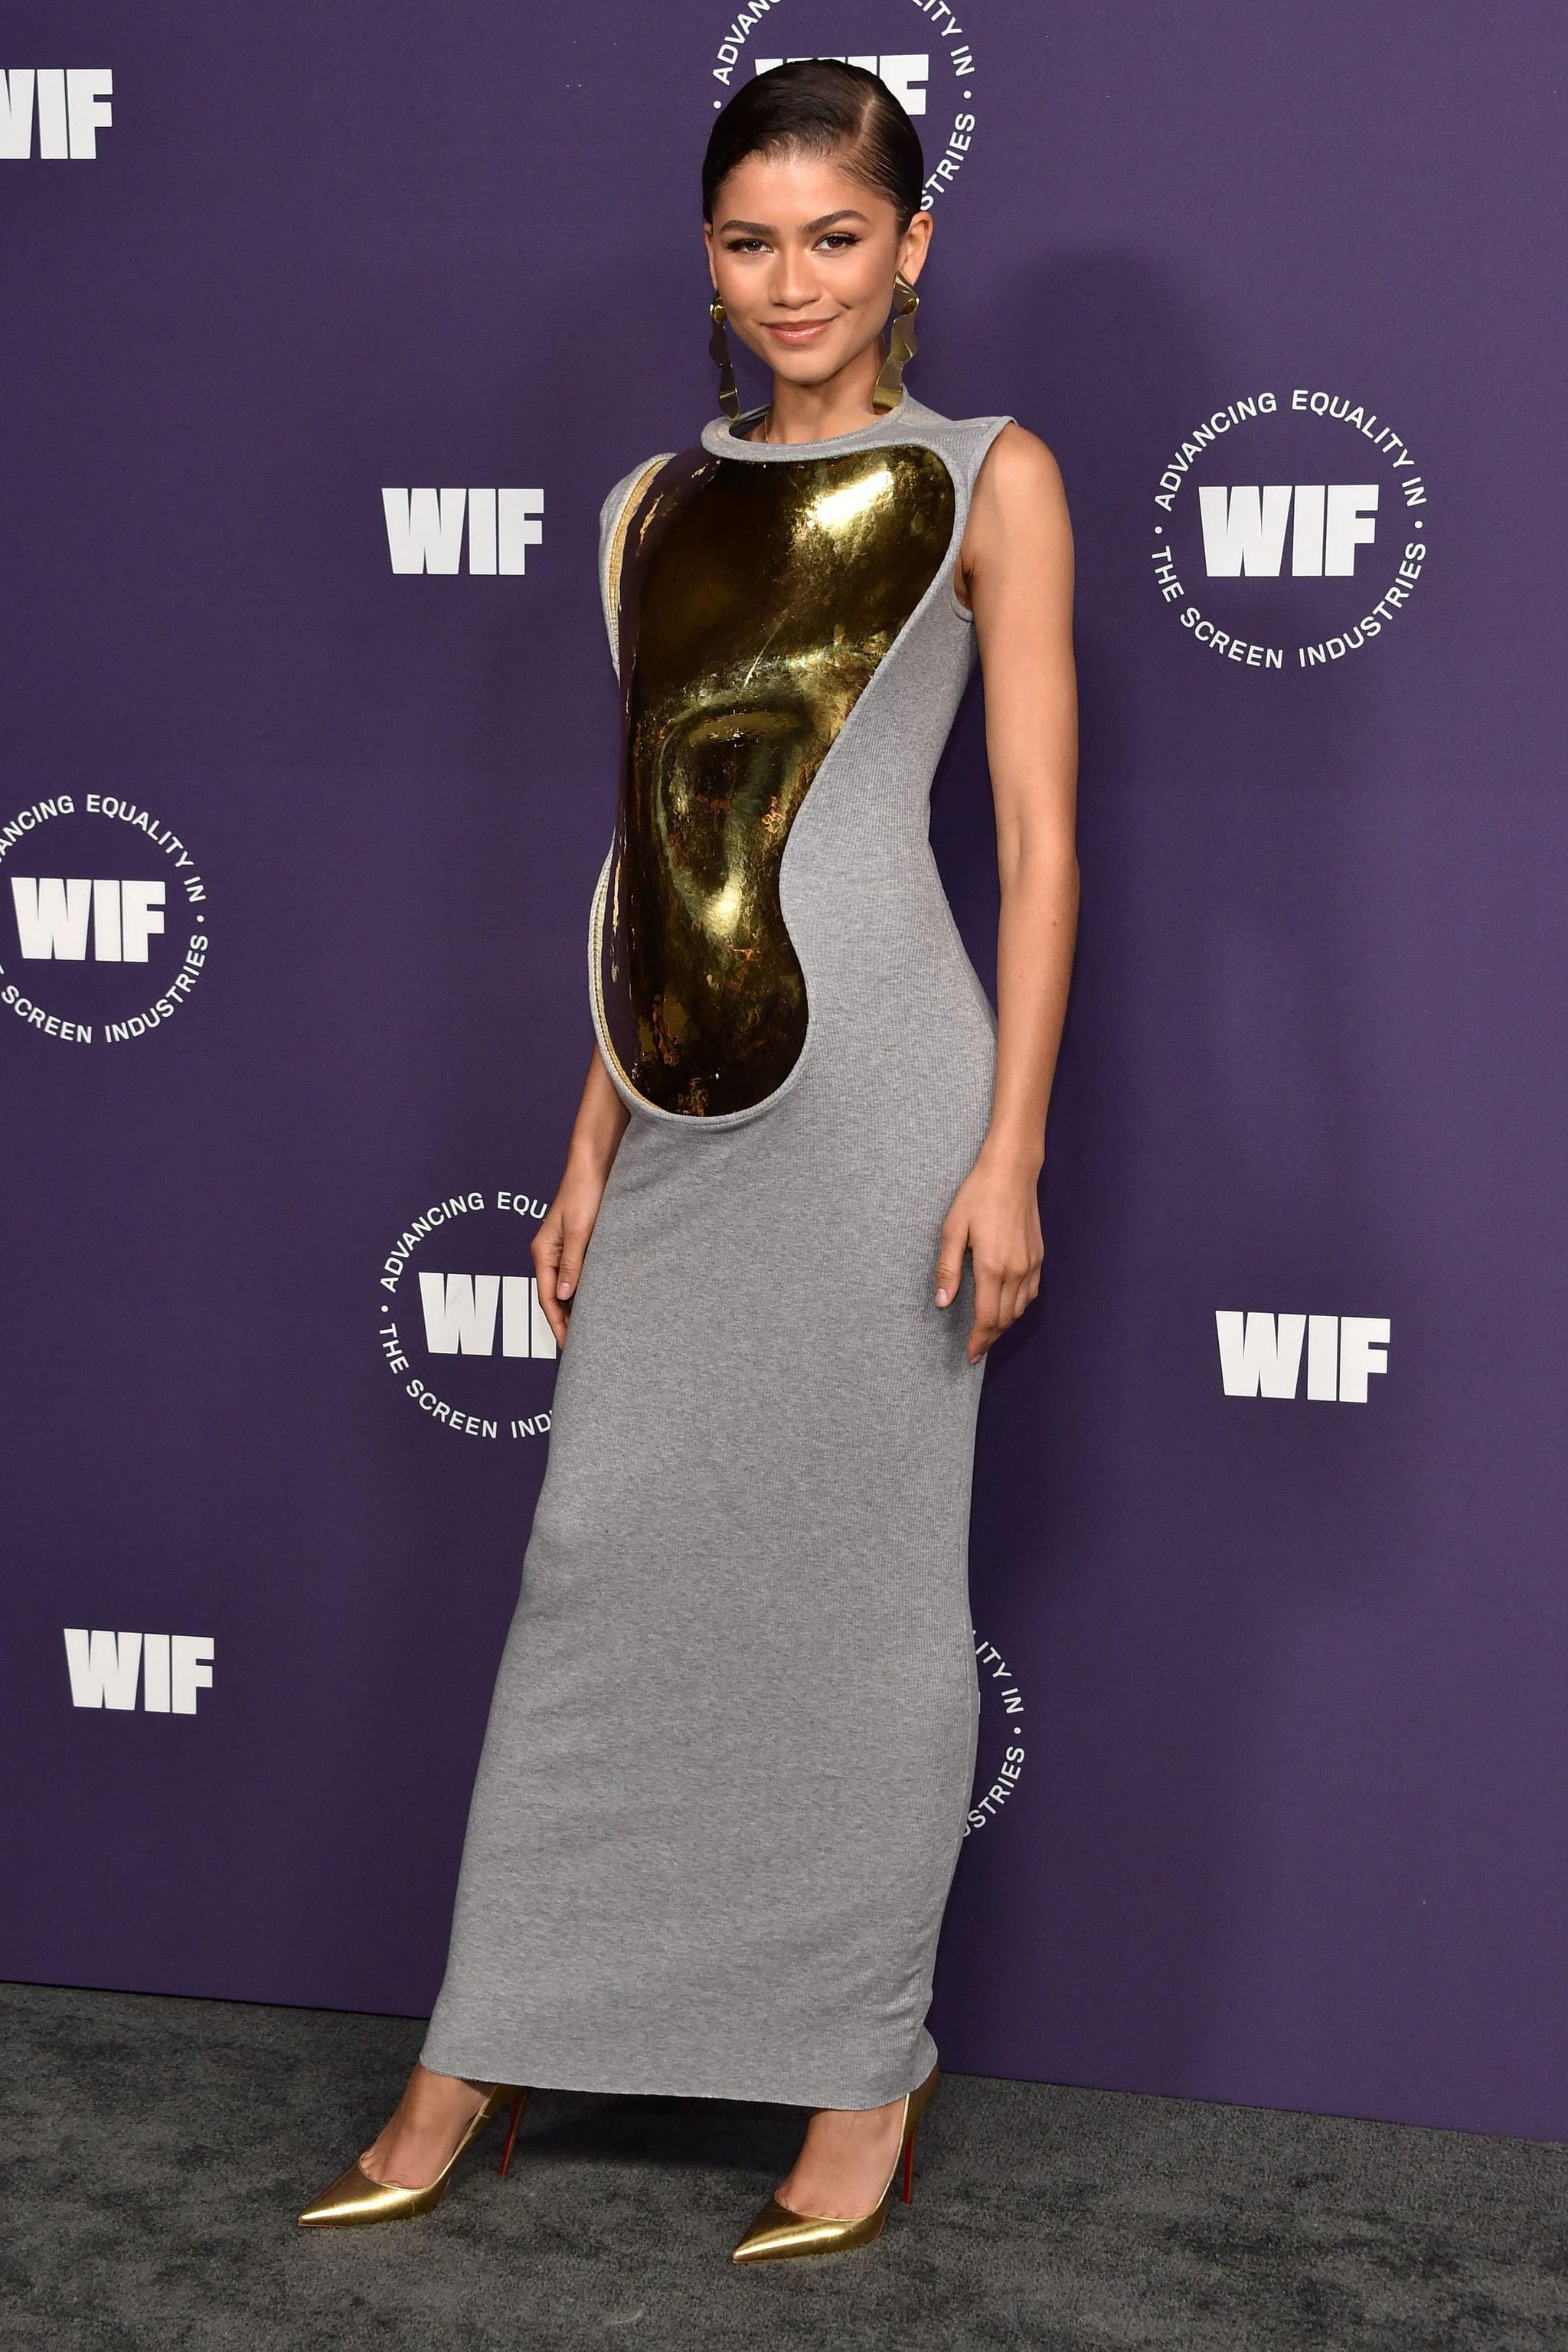 Zendaya's Gold-Plated Loewe Dress at Women in Film Honors   POPSUGAR Fashion